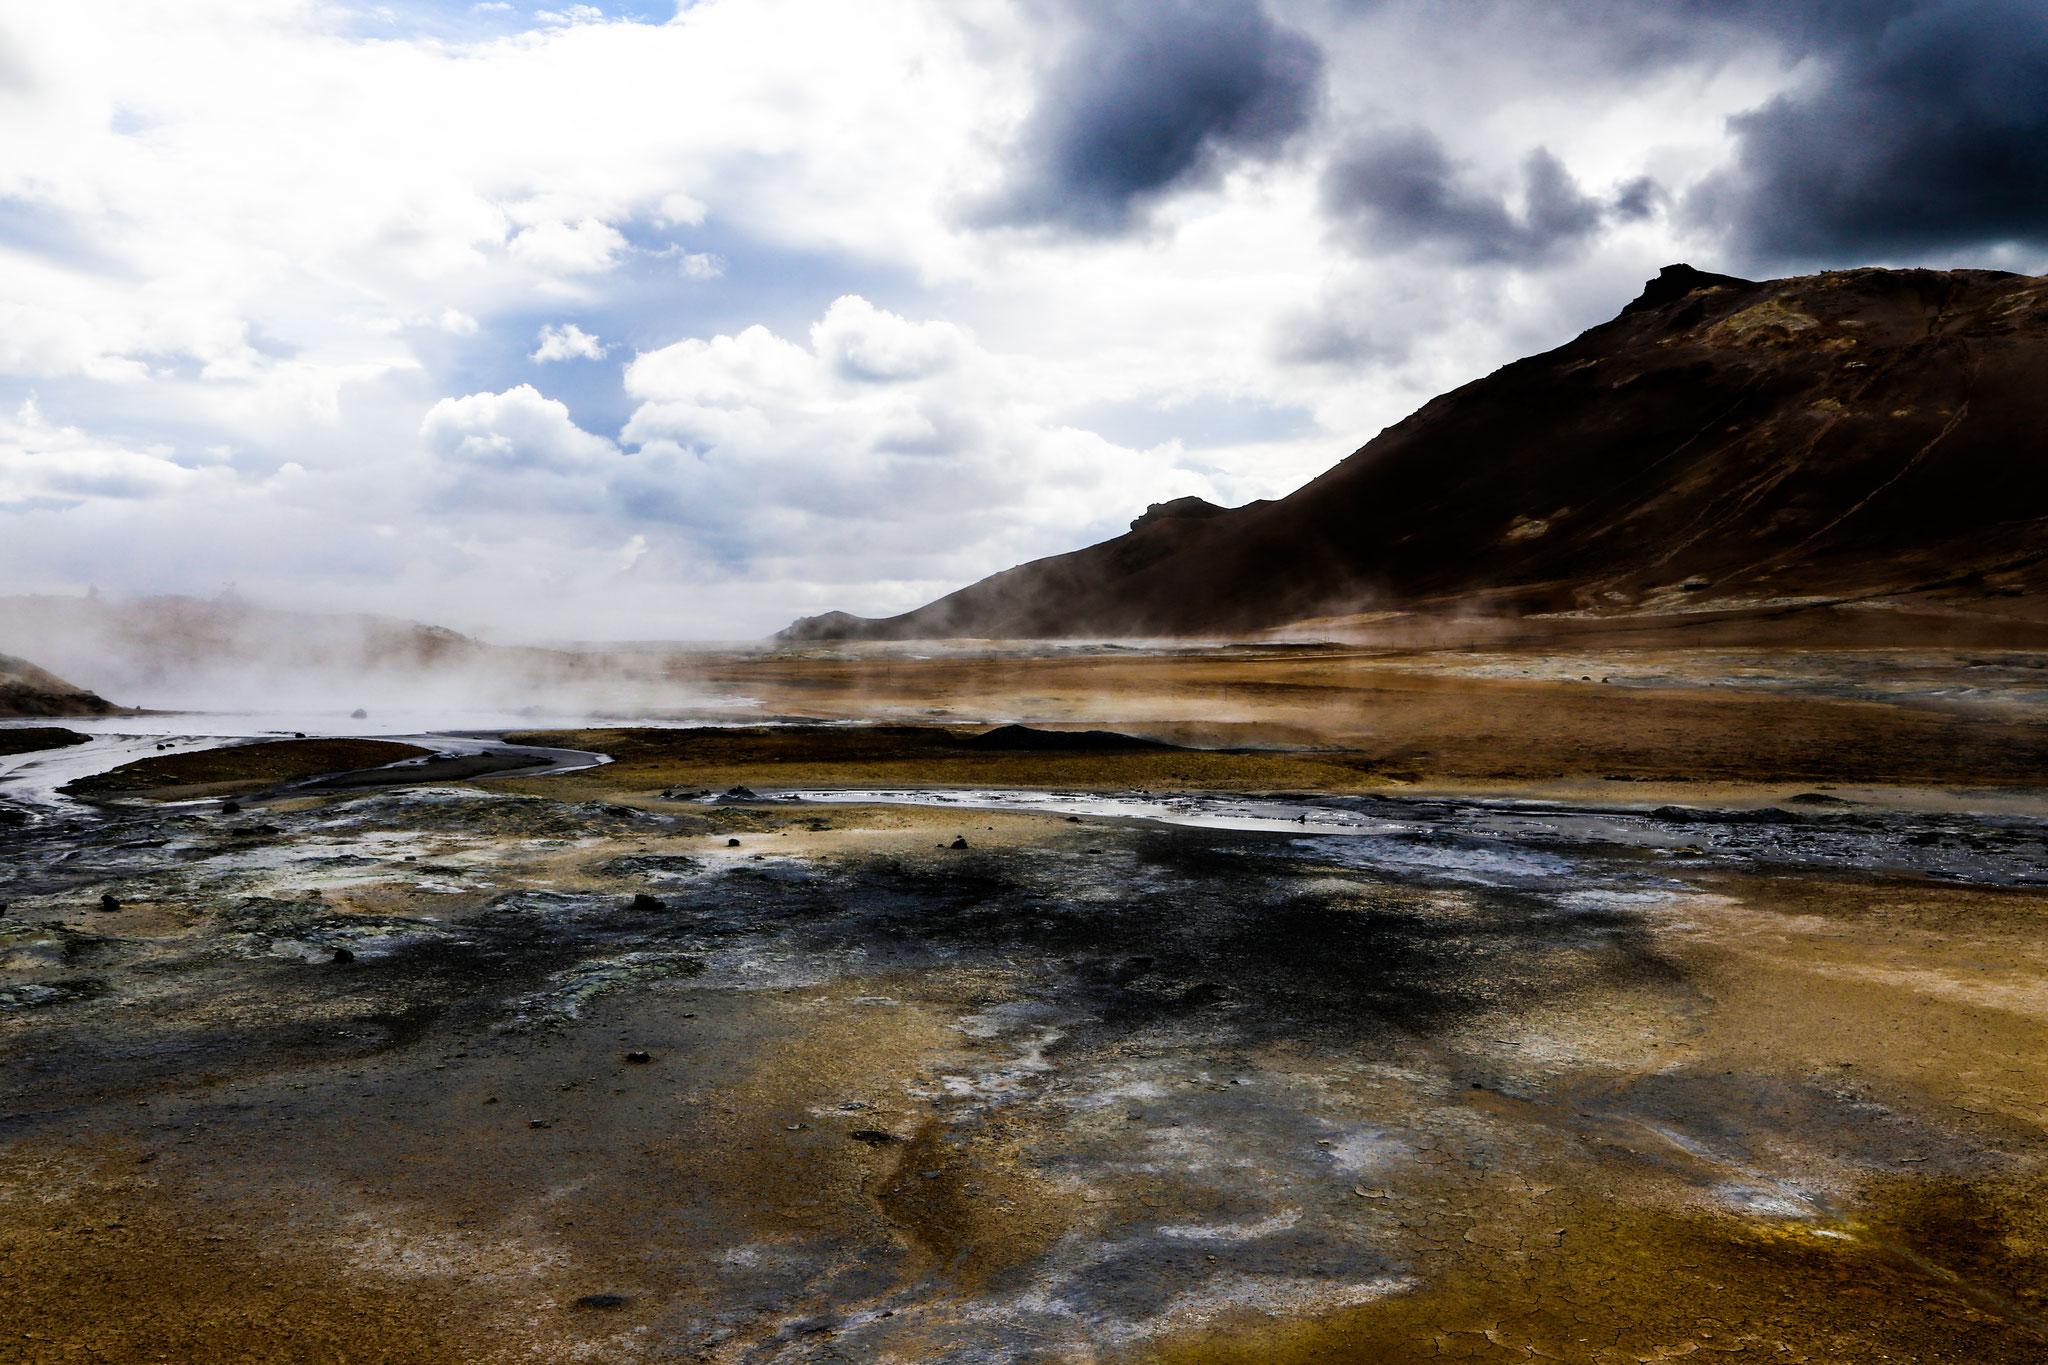 Hochtemperaturgebiet Hverarönd am Berg Námafjall